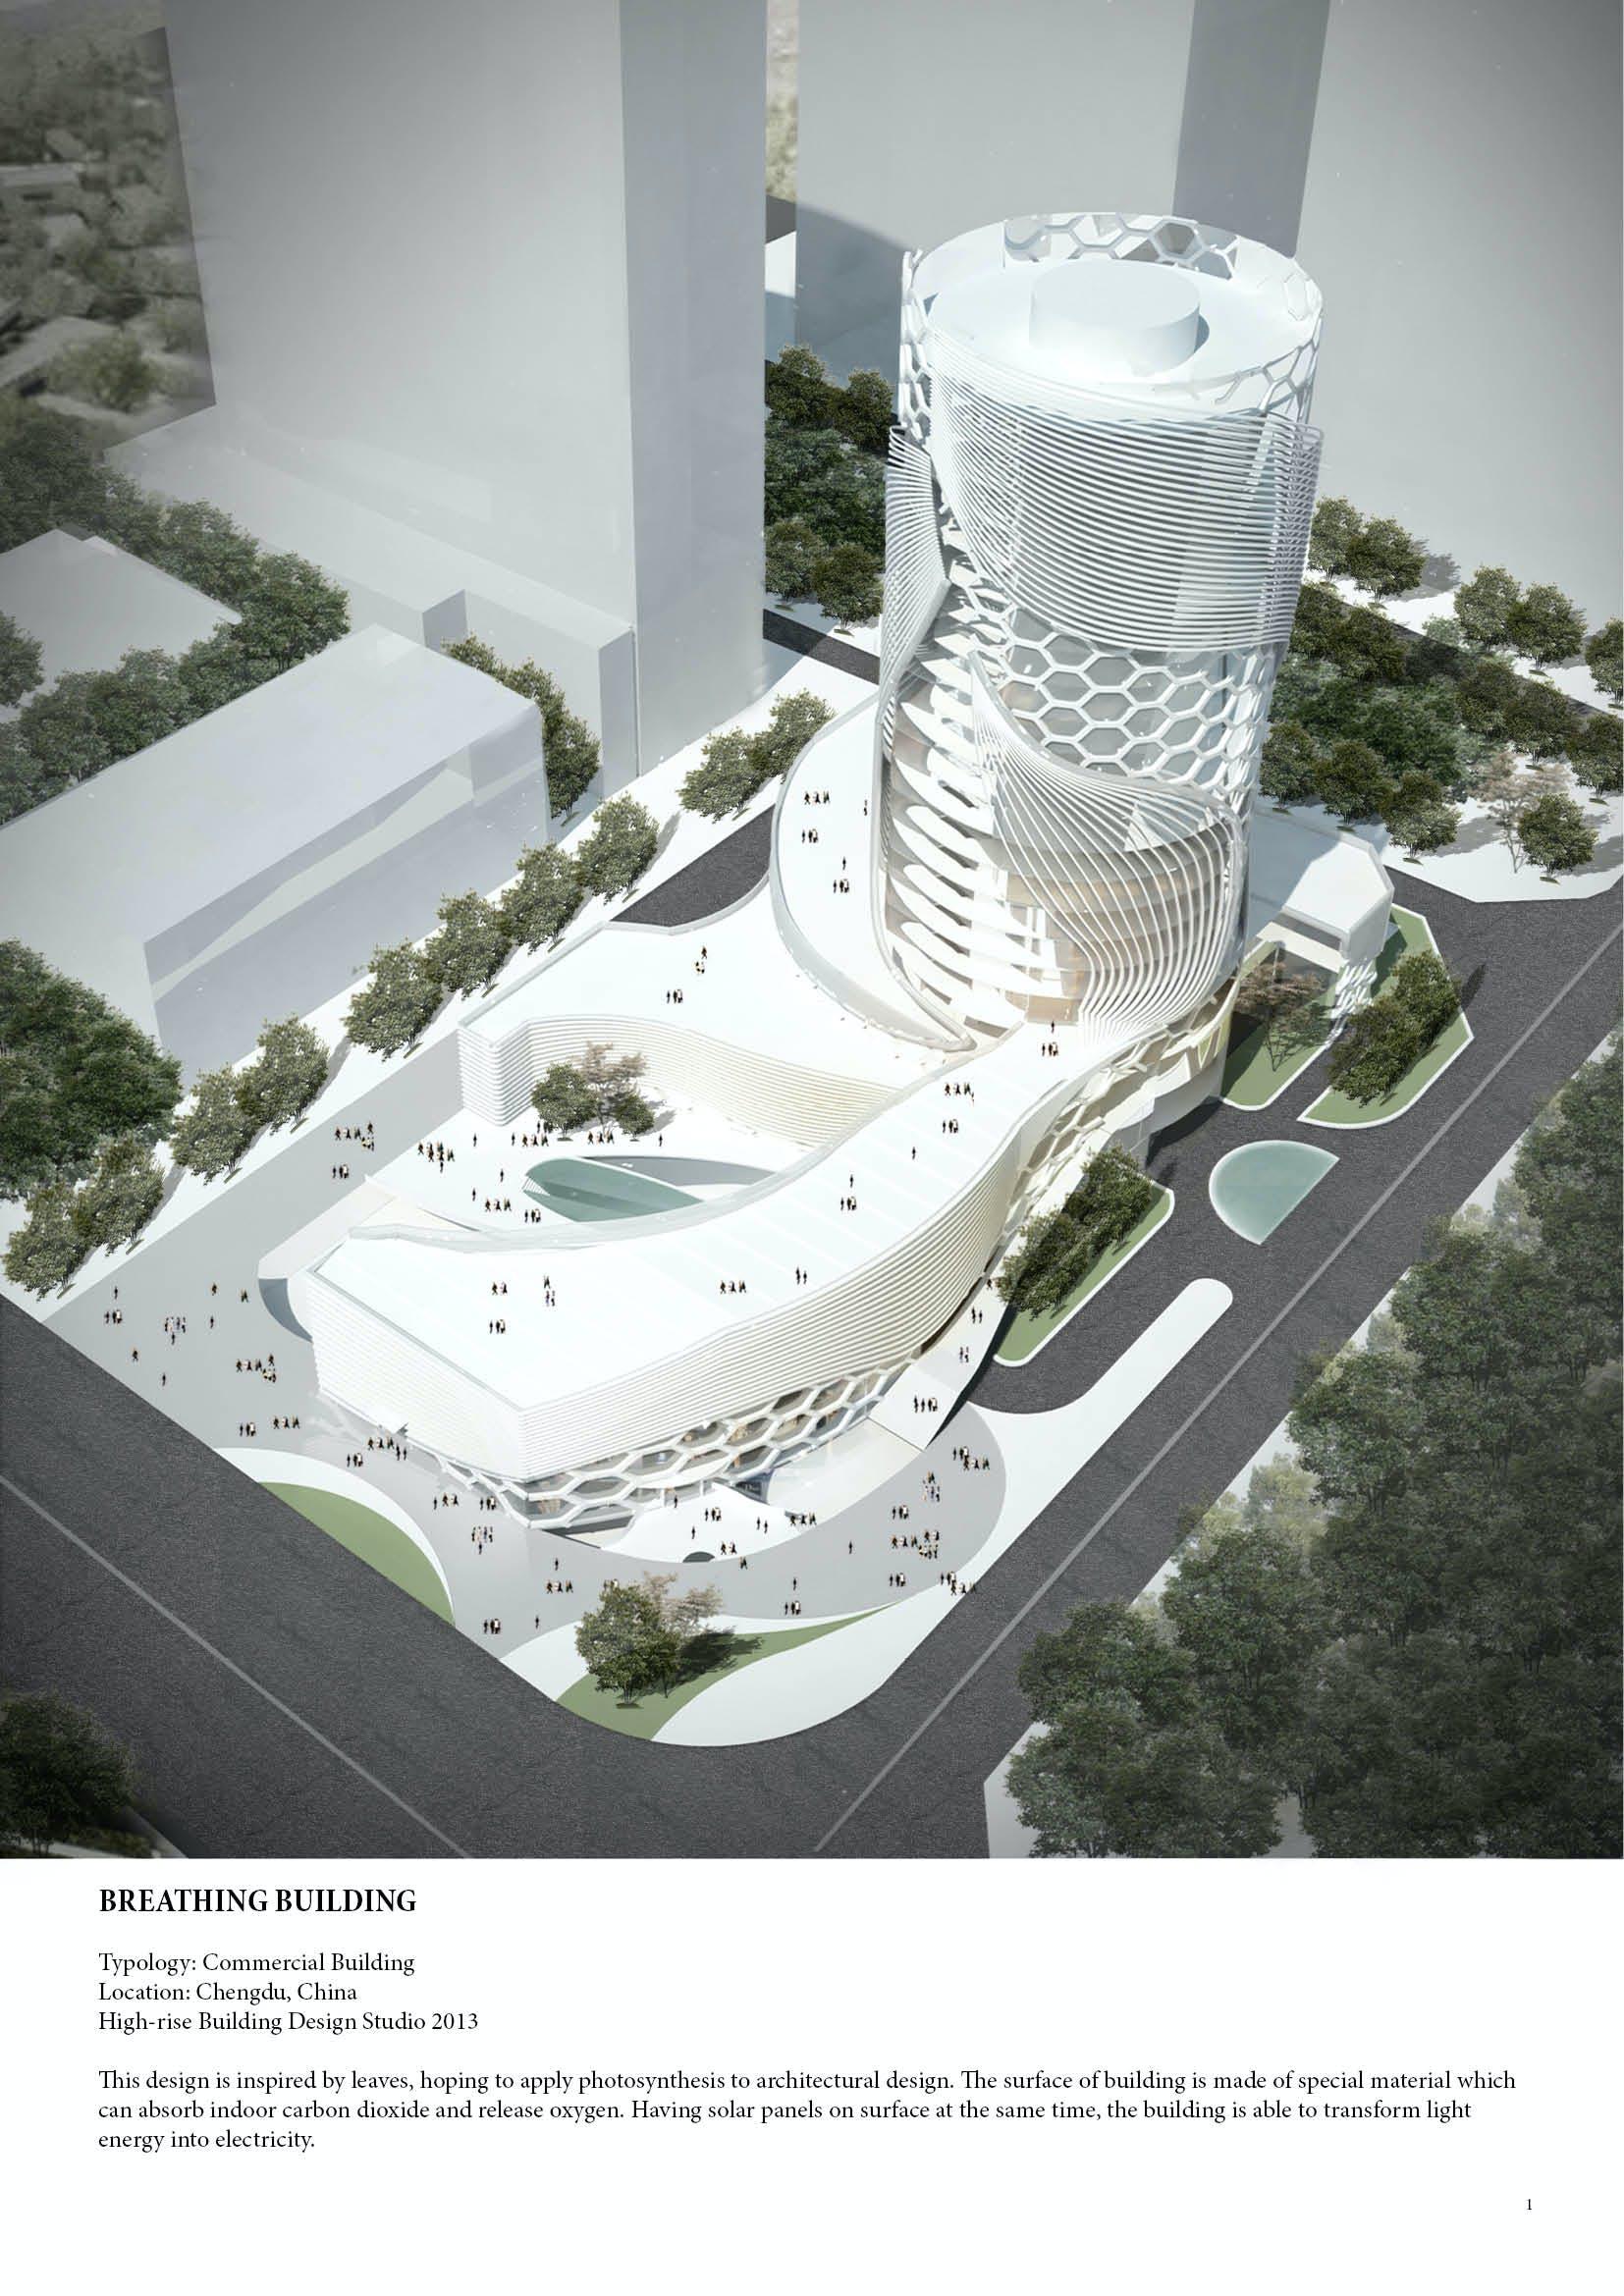 Breathing Building High Rise Building Design Studio 2013